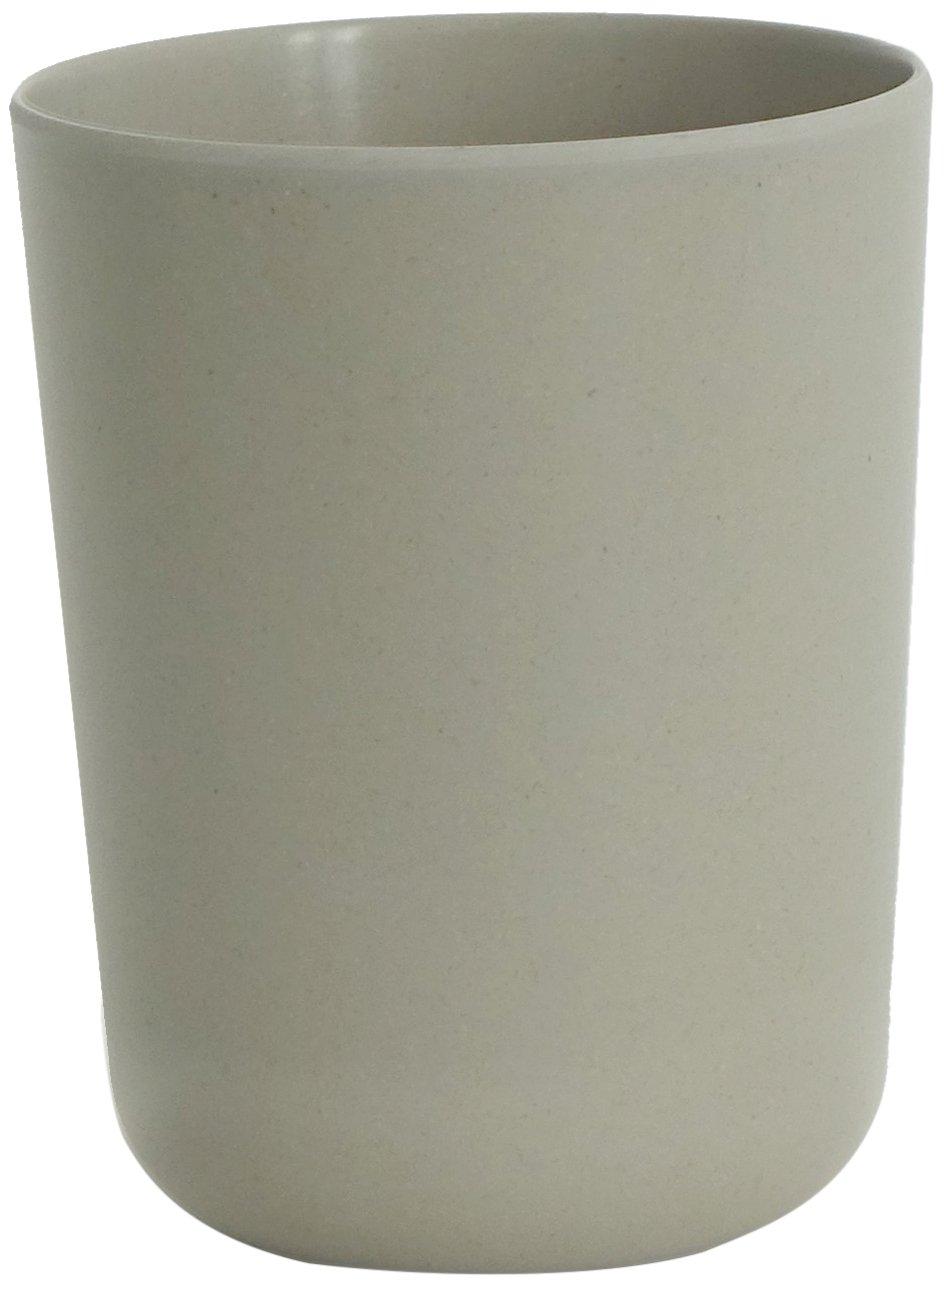 8/x 8/x 10/cm Grey BIOBU by EKOBO 36769/Bano Bamboo Toothbrush Holder